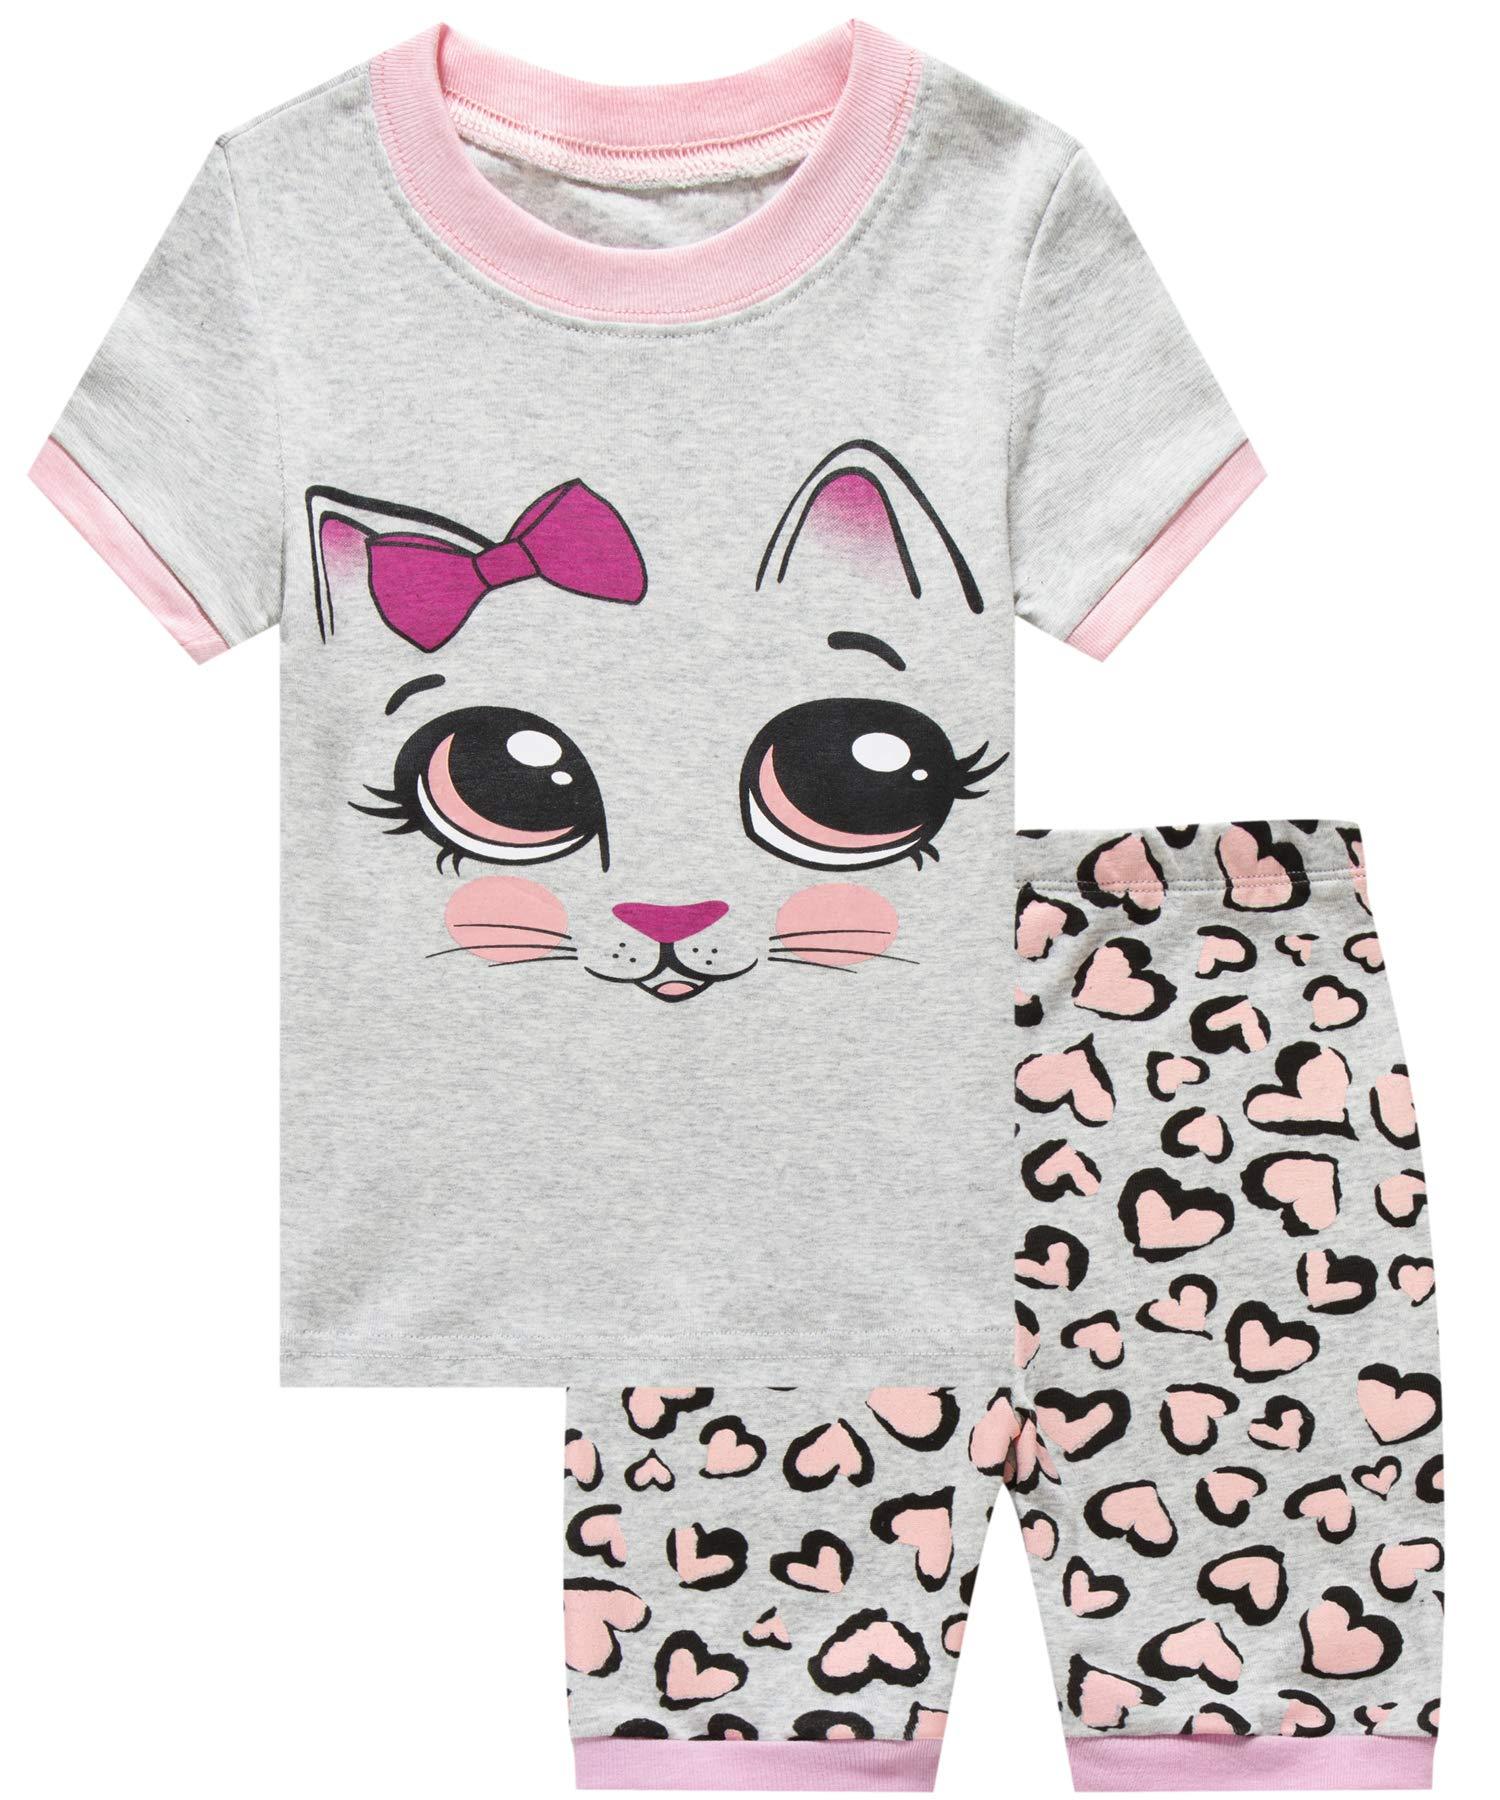 Girls Short Pajamas Cat Sleepwear 100% Cotton Summer Toddler Pjs Clothes Shirts 10T